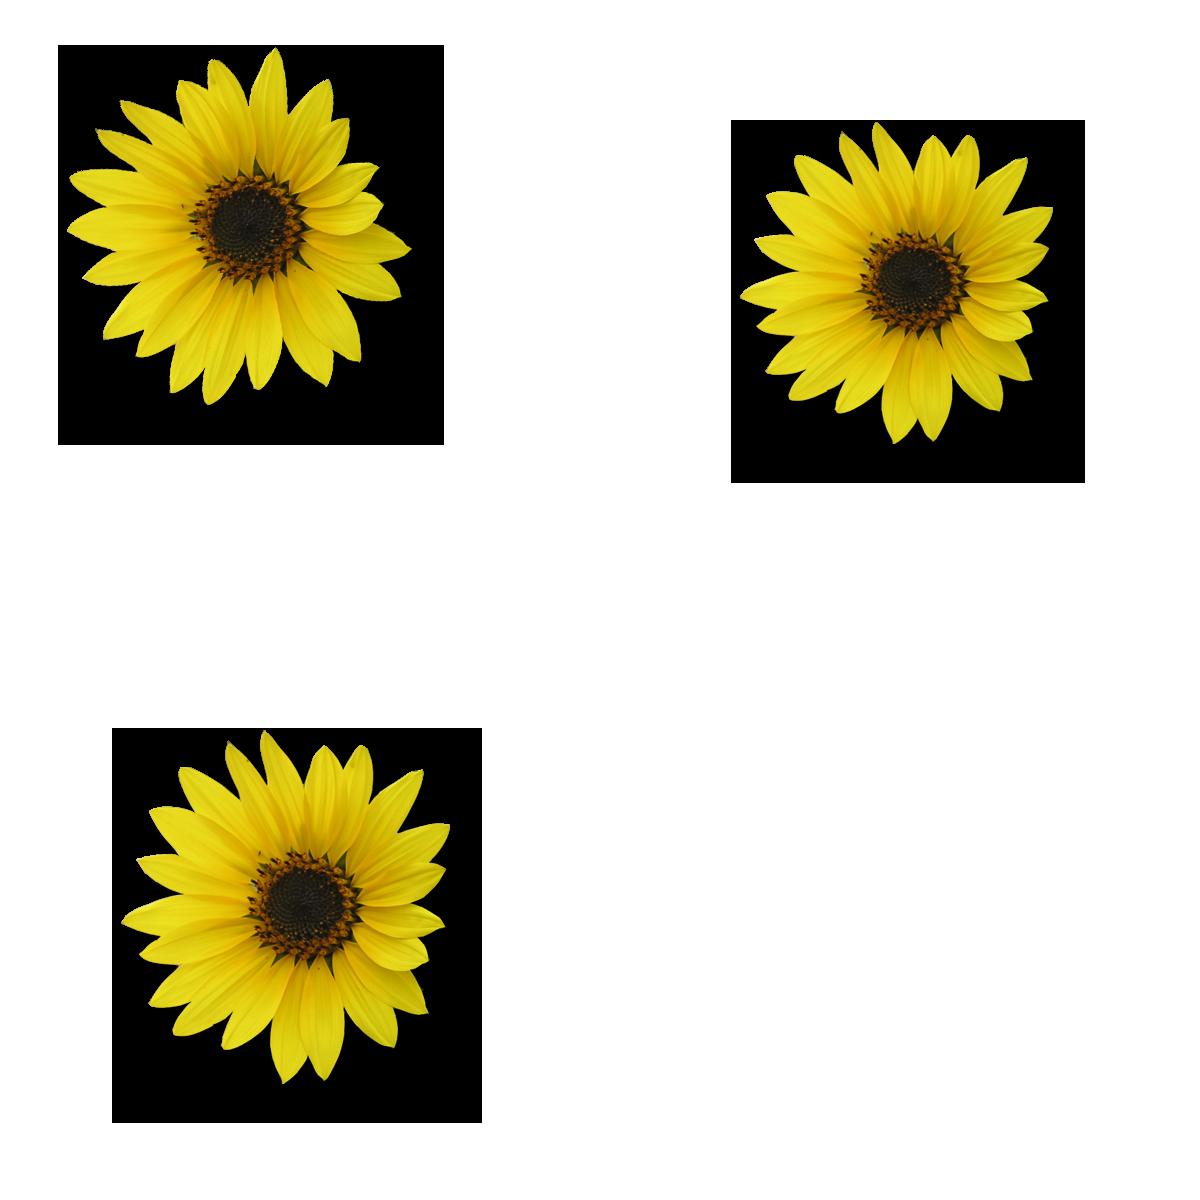 Sunflower Png Images Transparent Background: Sunflower Transparent PNG Pictures